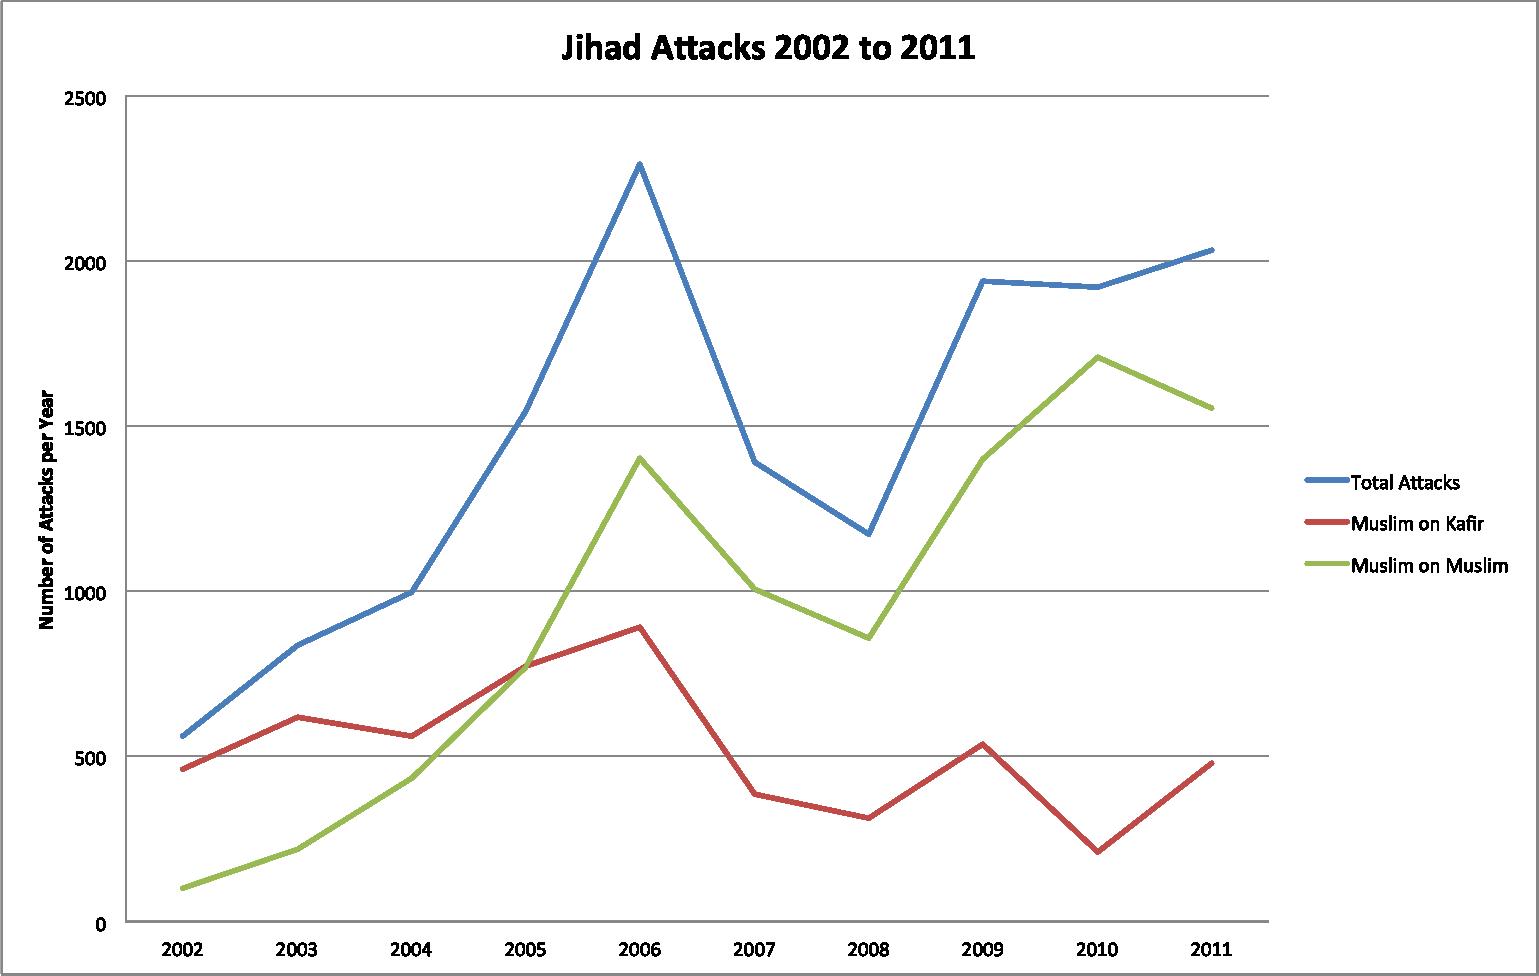 Jihad Attacks (2002-2011)